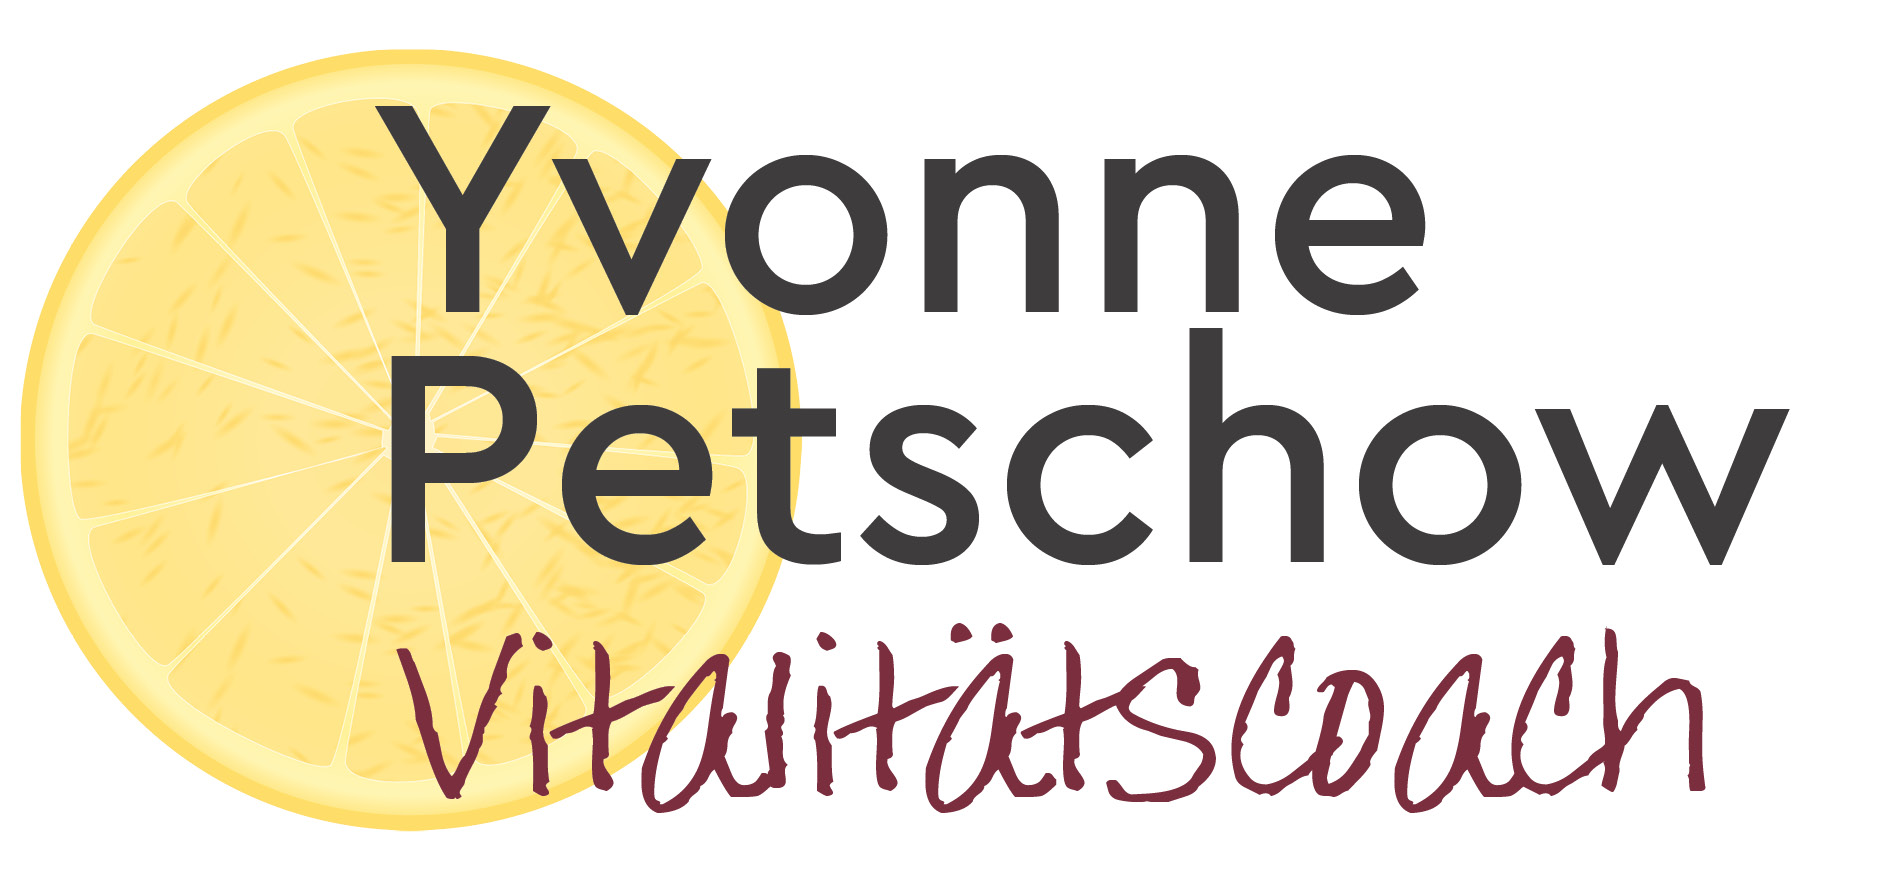 Yvonne Petschow - Vitalitätscoach Dresden